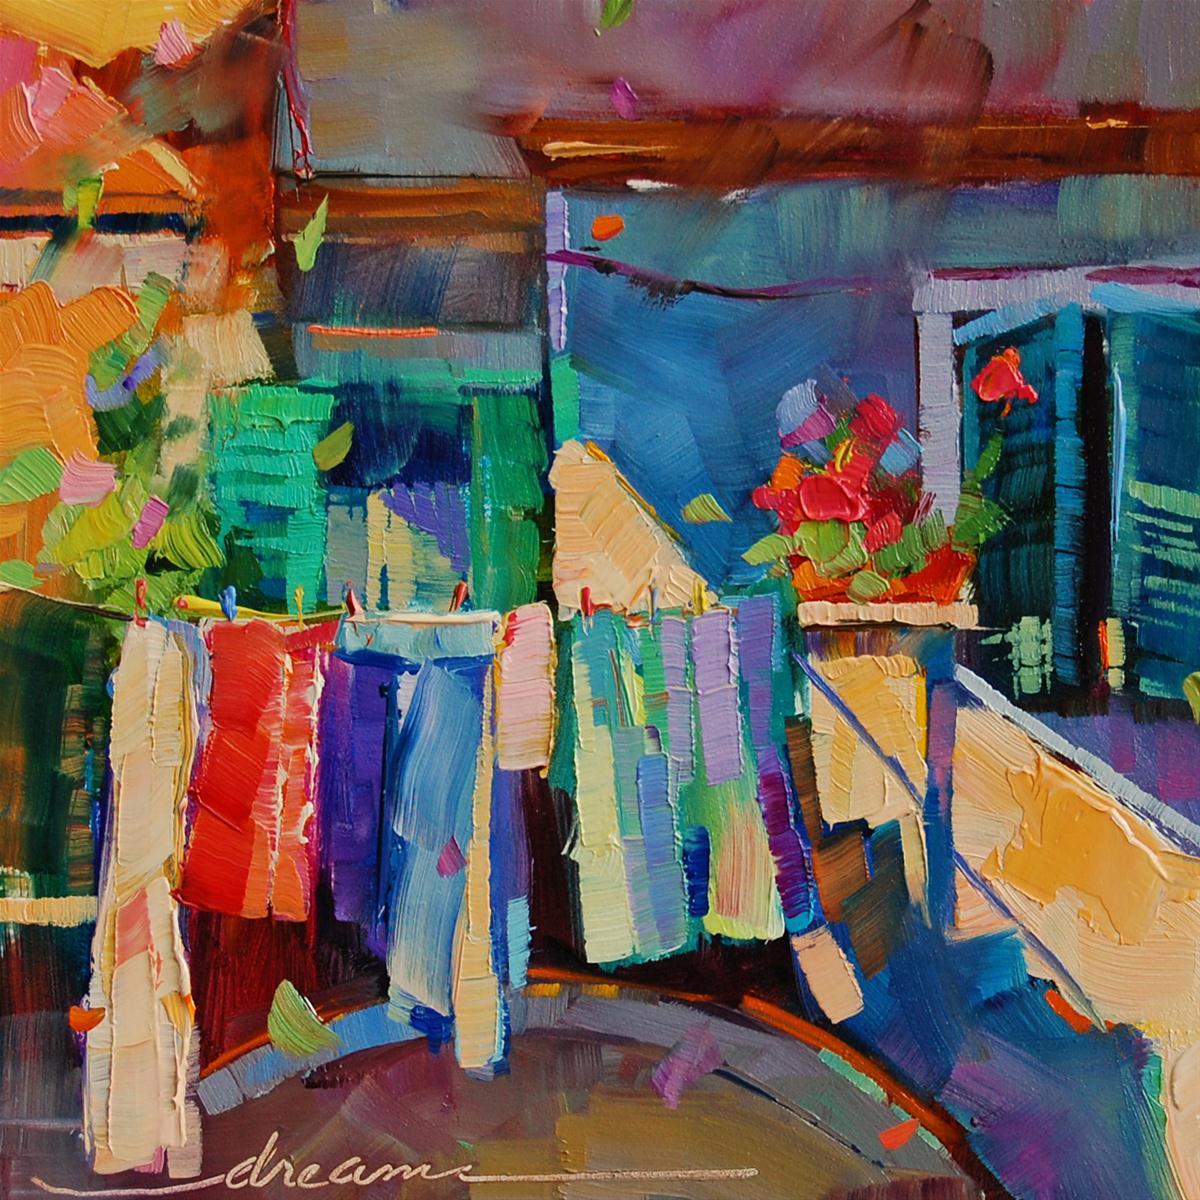 """Beautiful Simplicity"" original fine art by Dreama Tolle Perry"